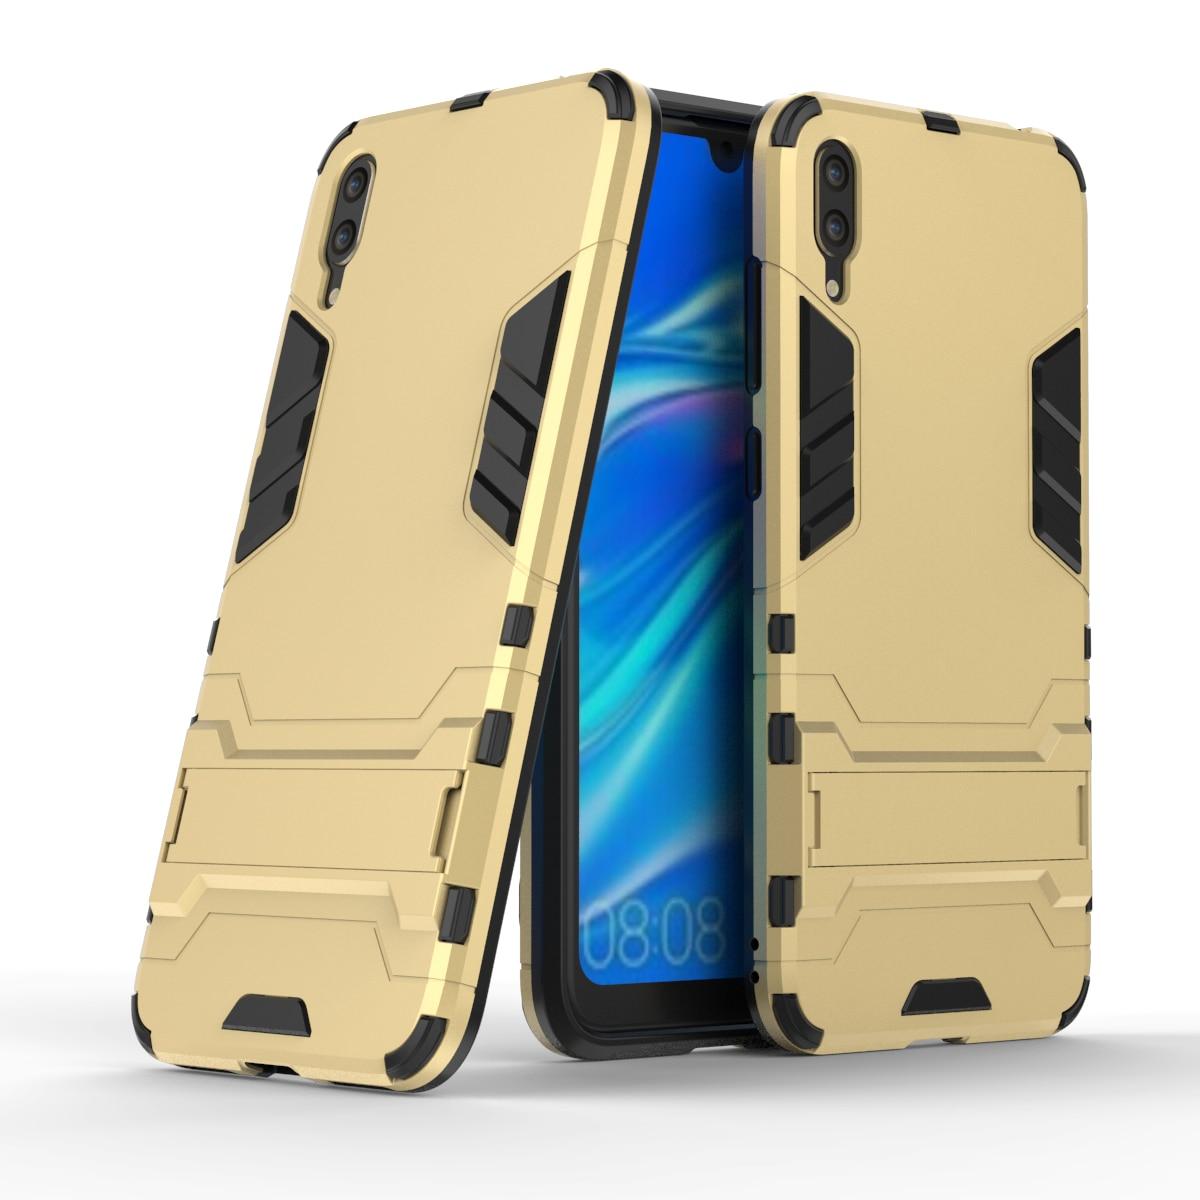 3D غلاف واقي مضاد للصدمات حالات لهواوي التمتع 9 زائد 9 S 9e ماكس 8 8e لايت 8 زائد 5 6 6 s 7 زائد 7 s TPU حامل هاتف قذيفة غطاء